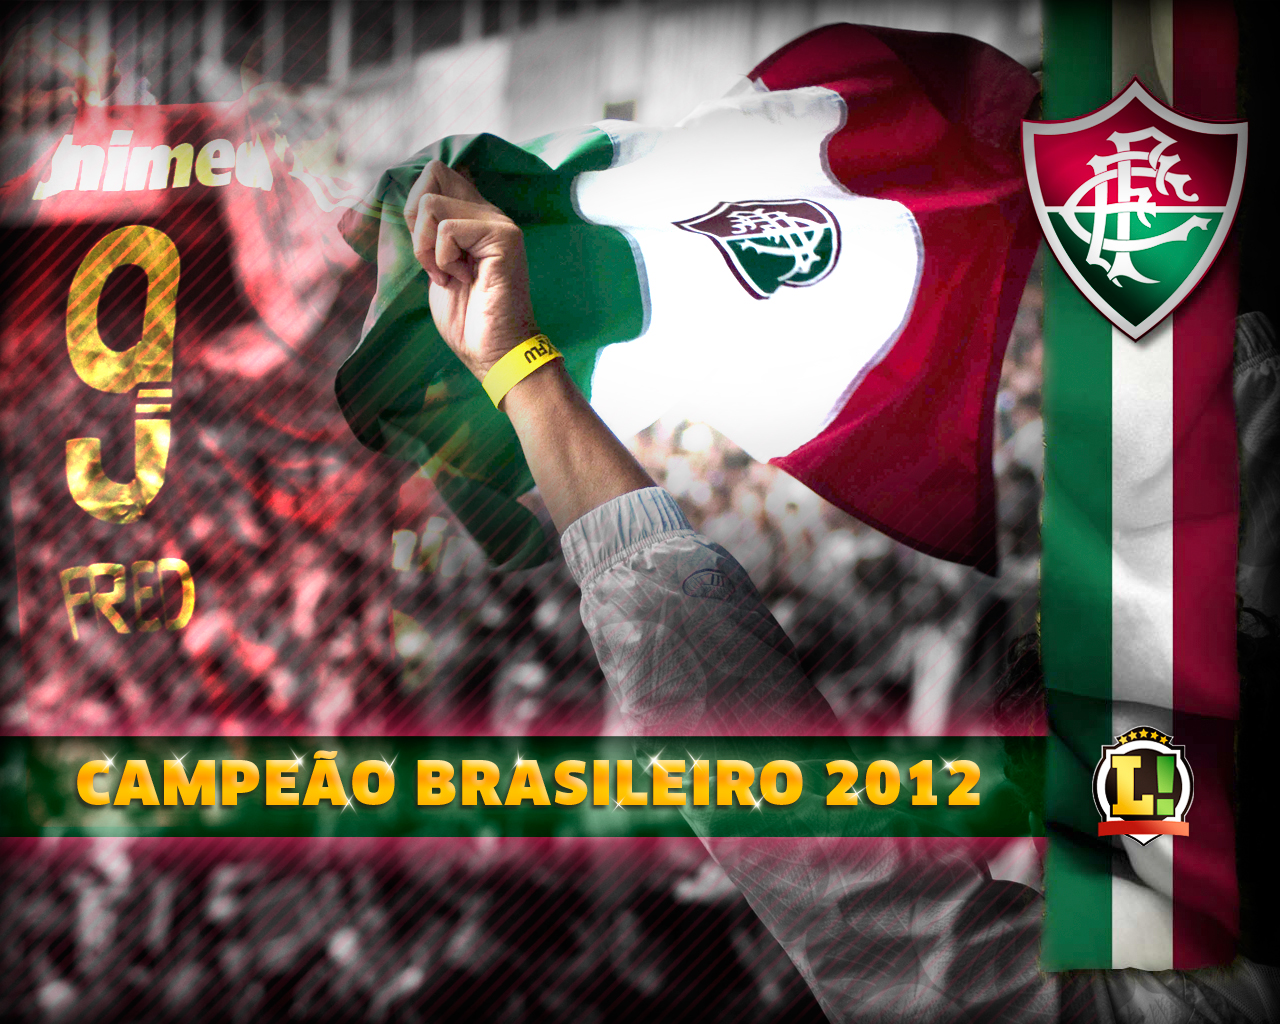 Wallpaper: Fluminense Campeão Brasileiro 2012 (3)